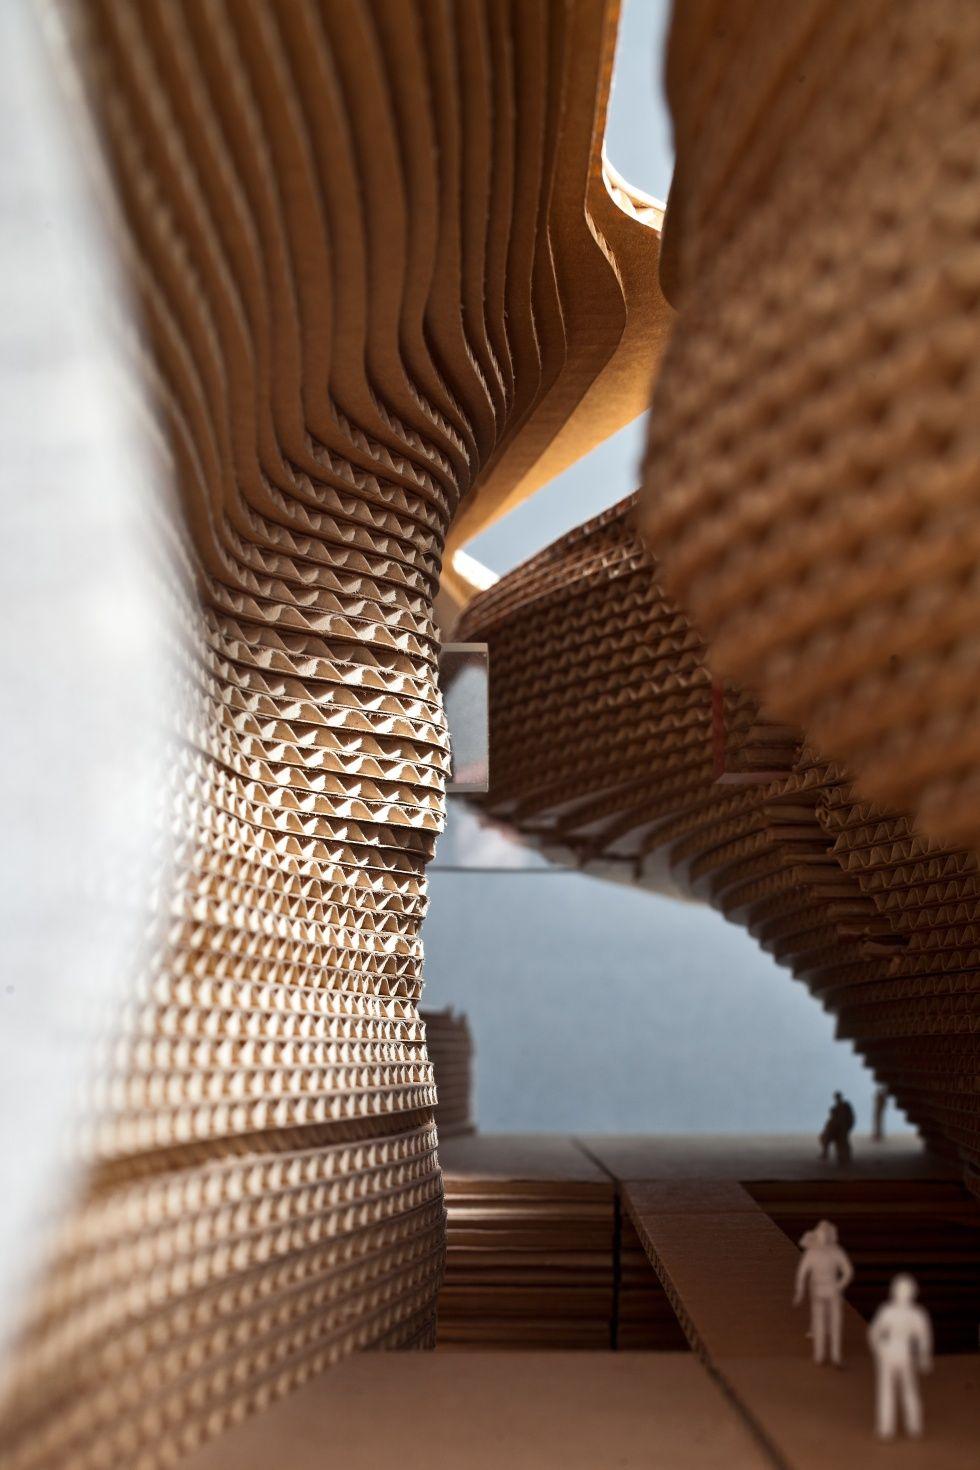 lahdelma mahlam ki muzeum historii yd w polskich architecture models pinterest. Black Bedroom Furniture Sets. Home Design Ideas